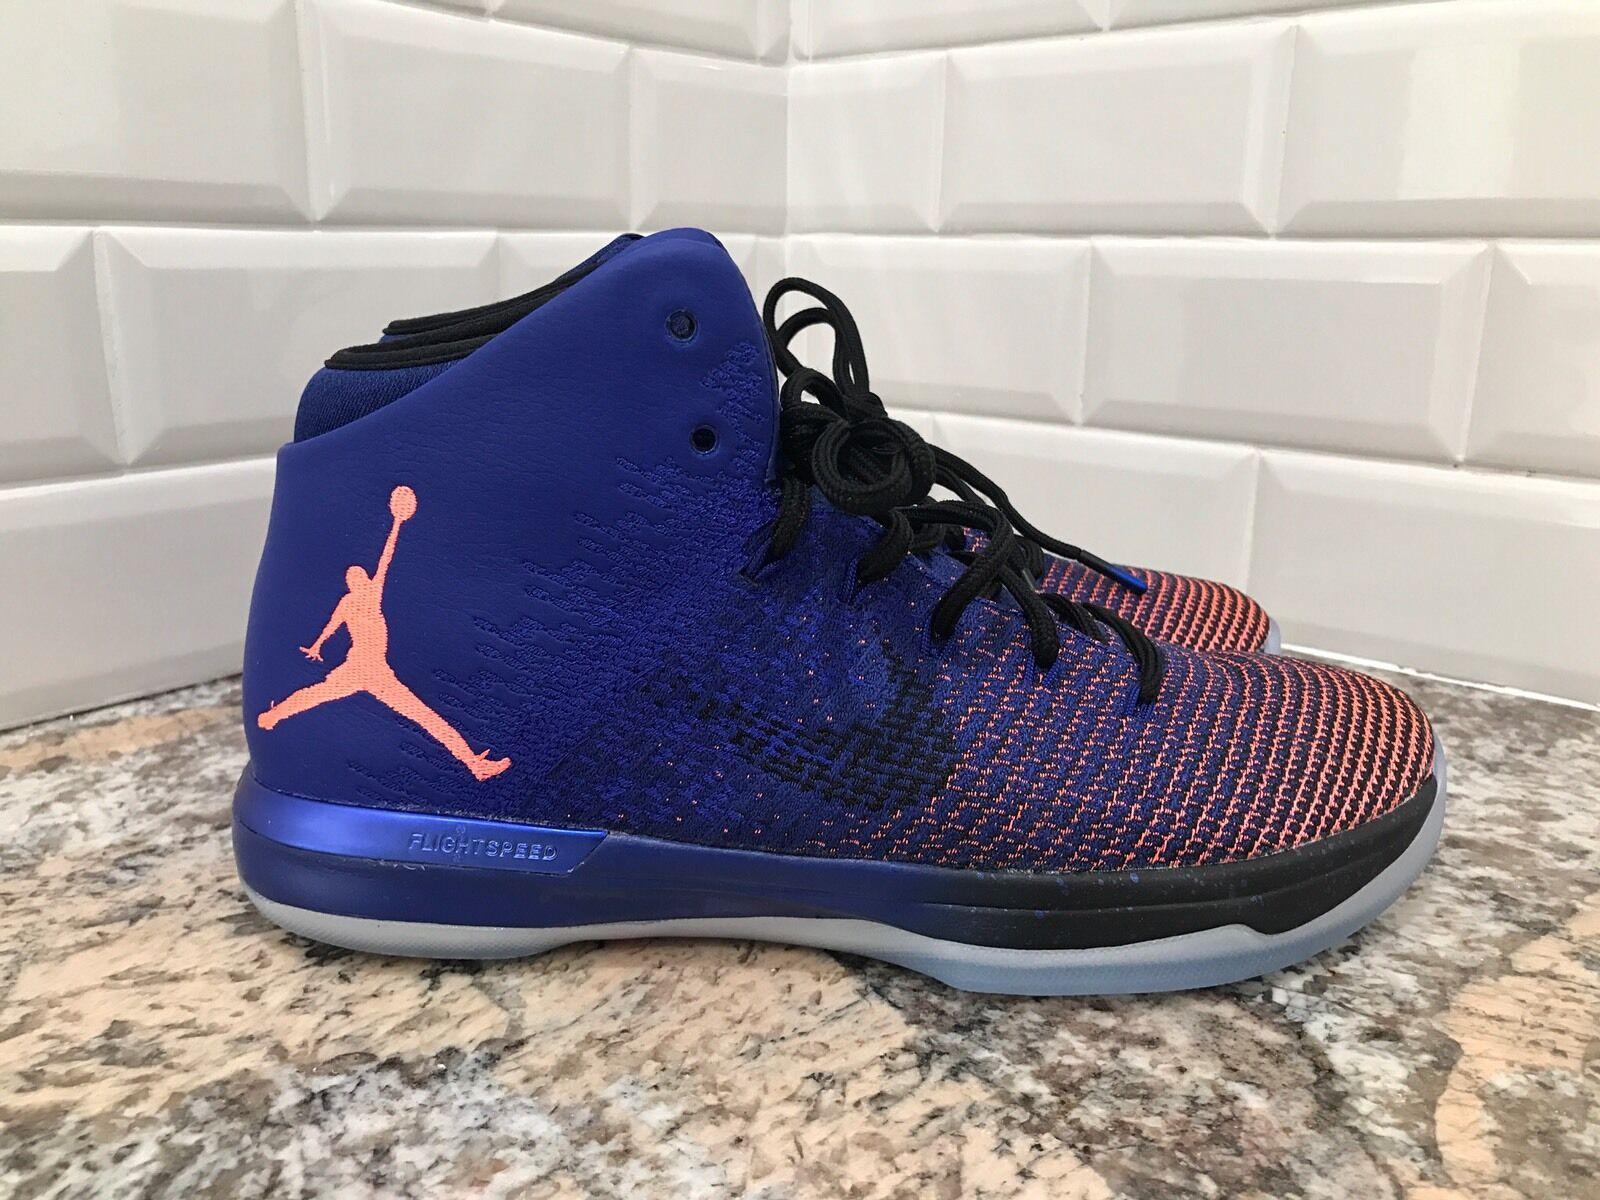 Nike Air Jordan XXXI 31 Supernova Concord Mango AJ31 Men's SZ 8 845037-400